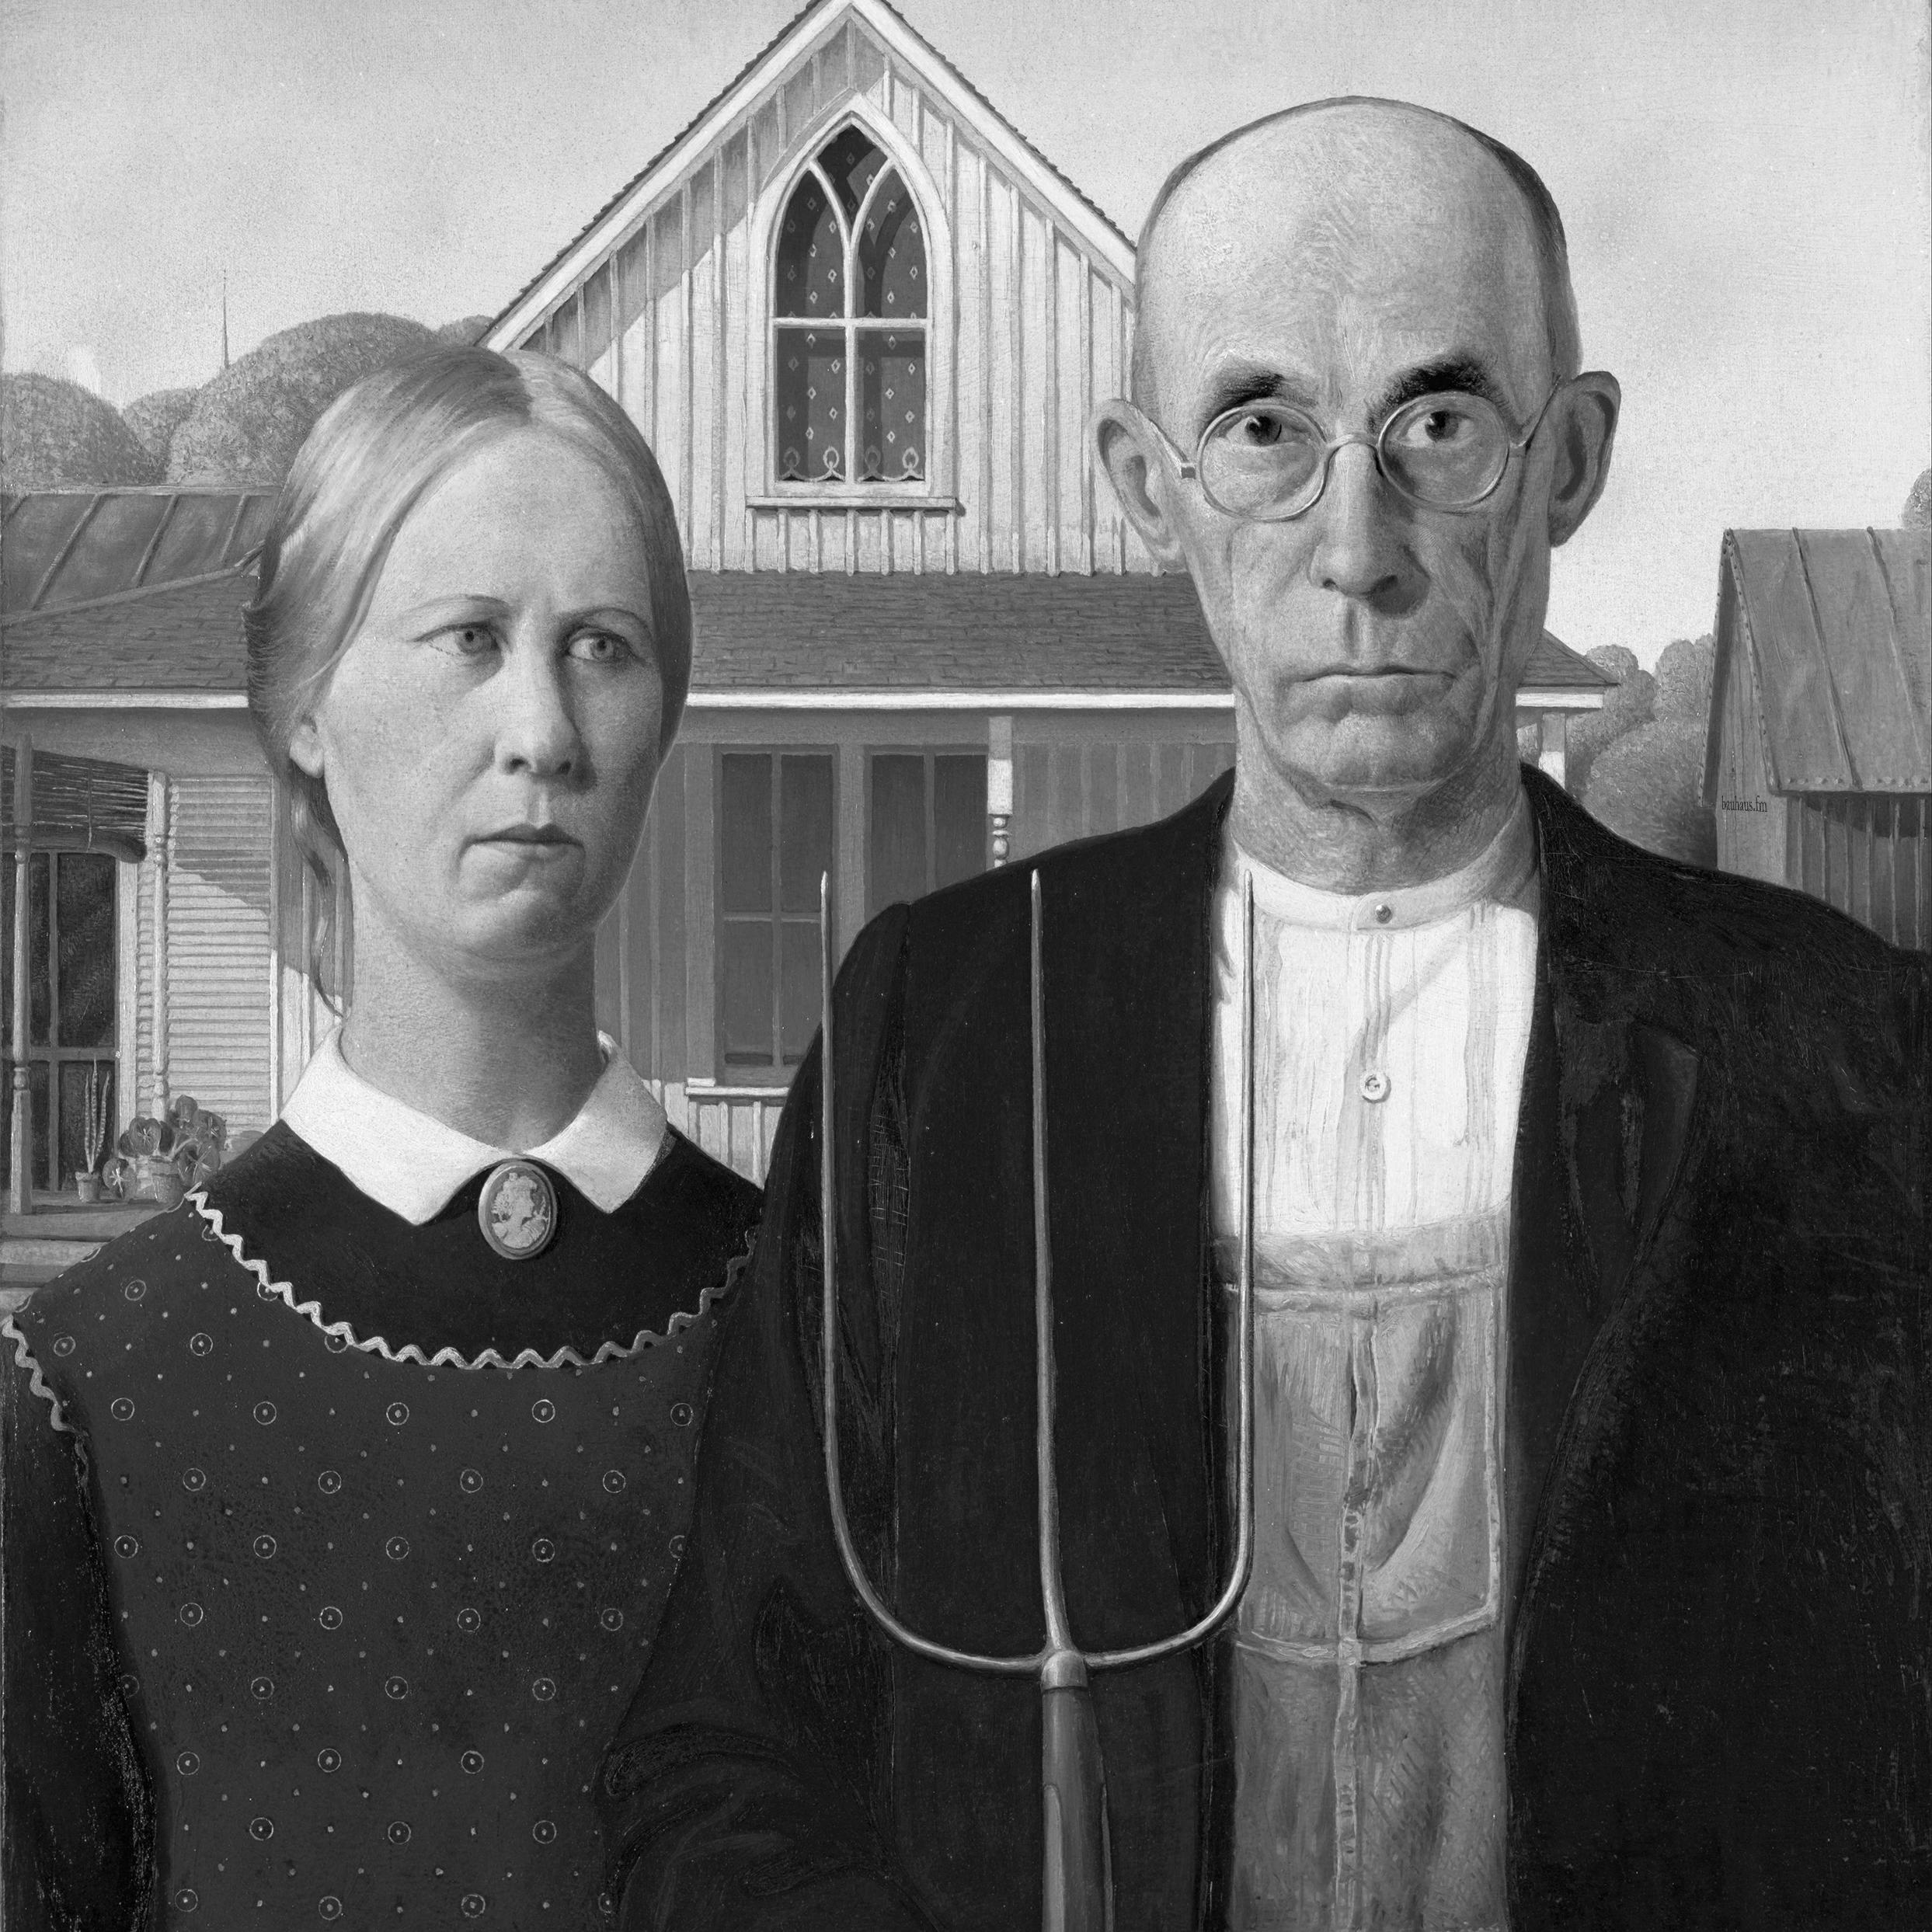 Grant Wood, American Gothic.